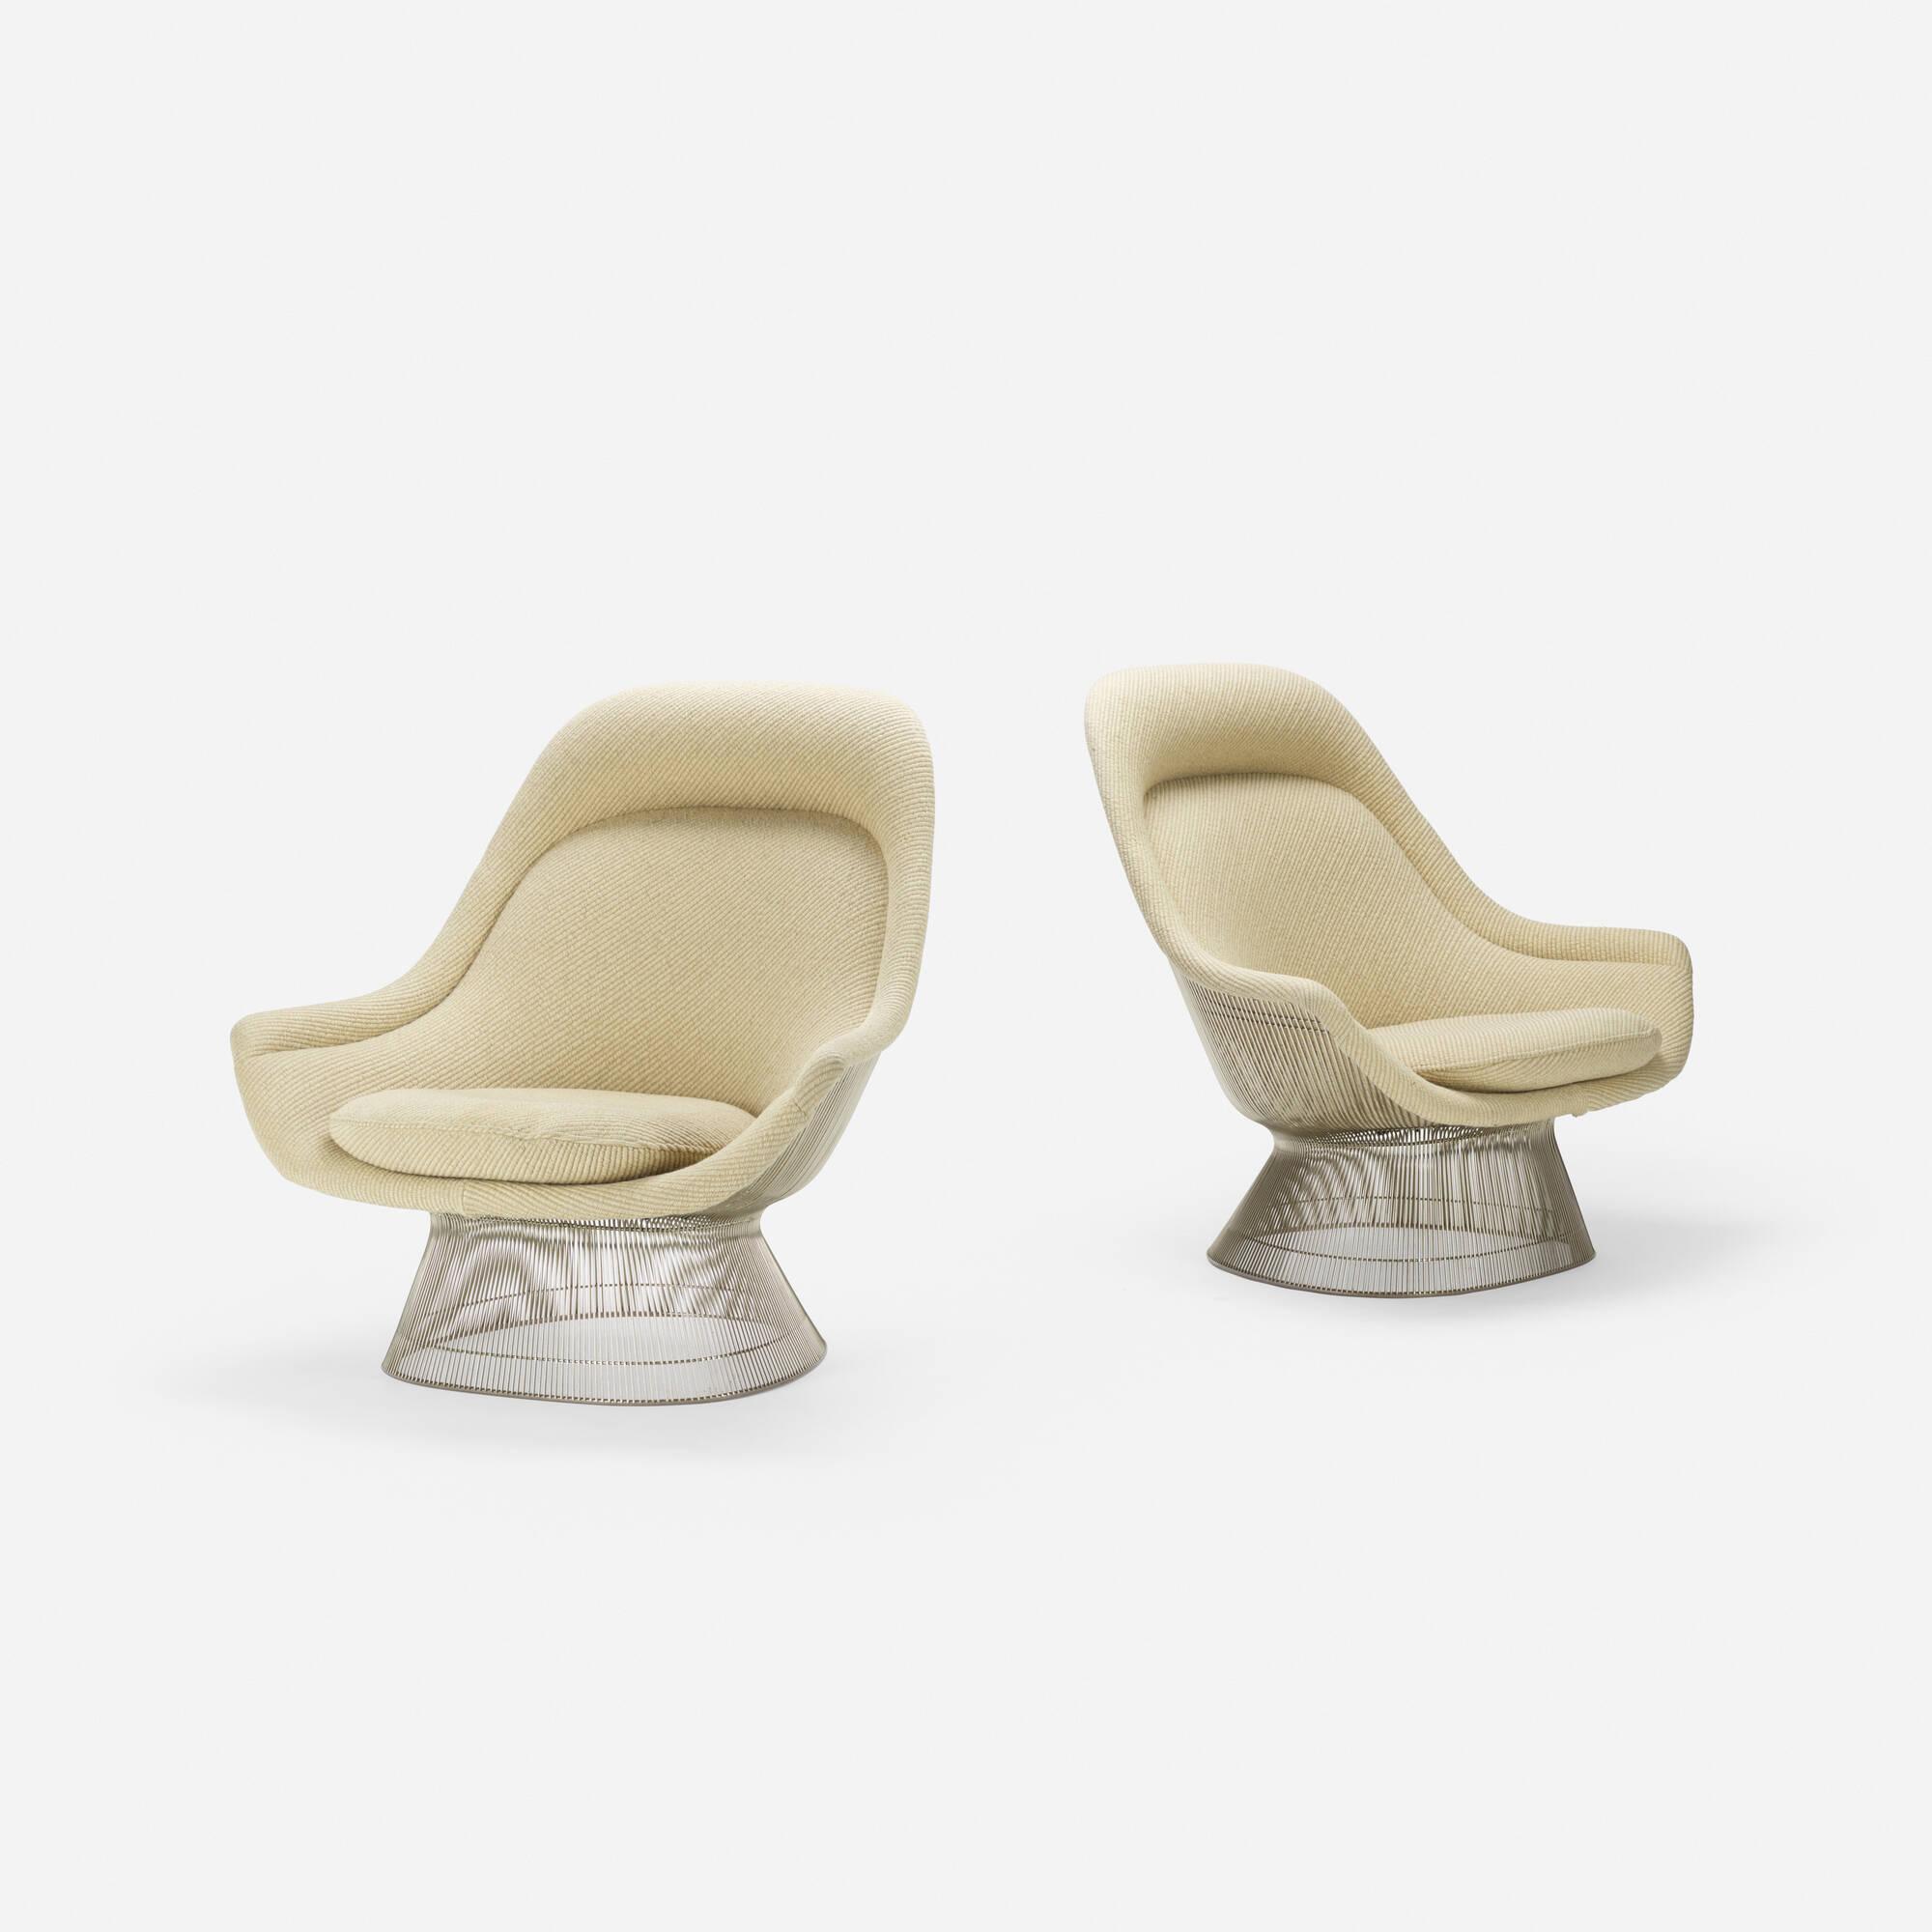 296: Warren Platner / lounge chairs, pair (2 of 4)